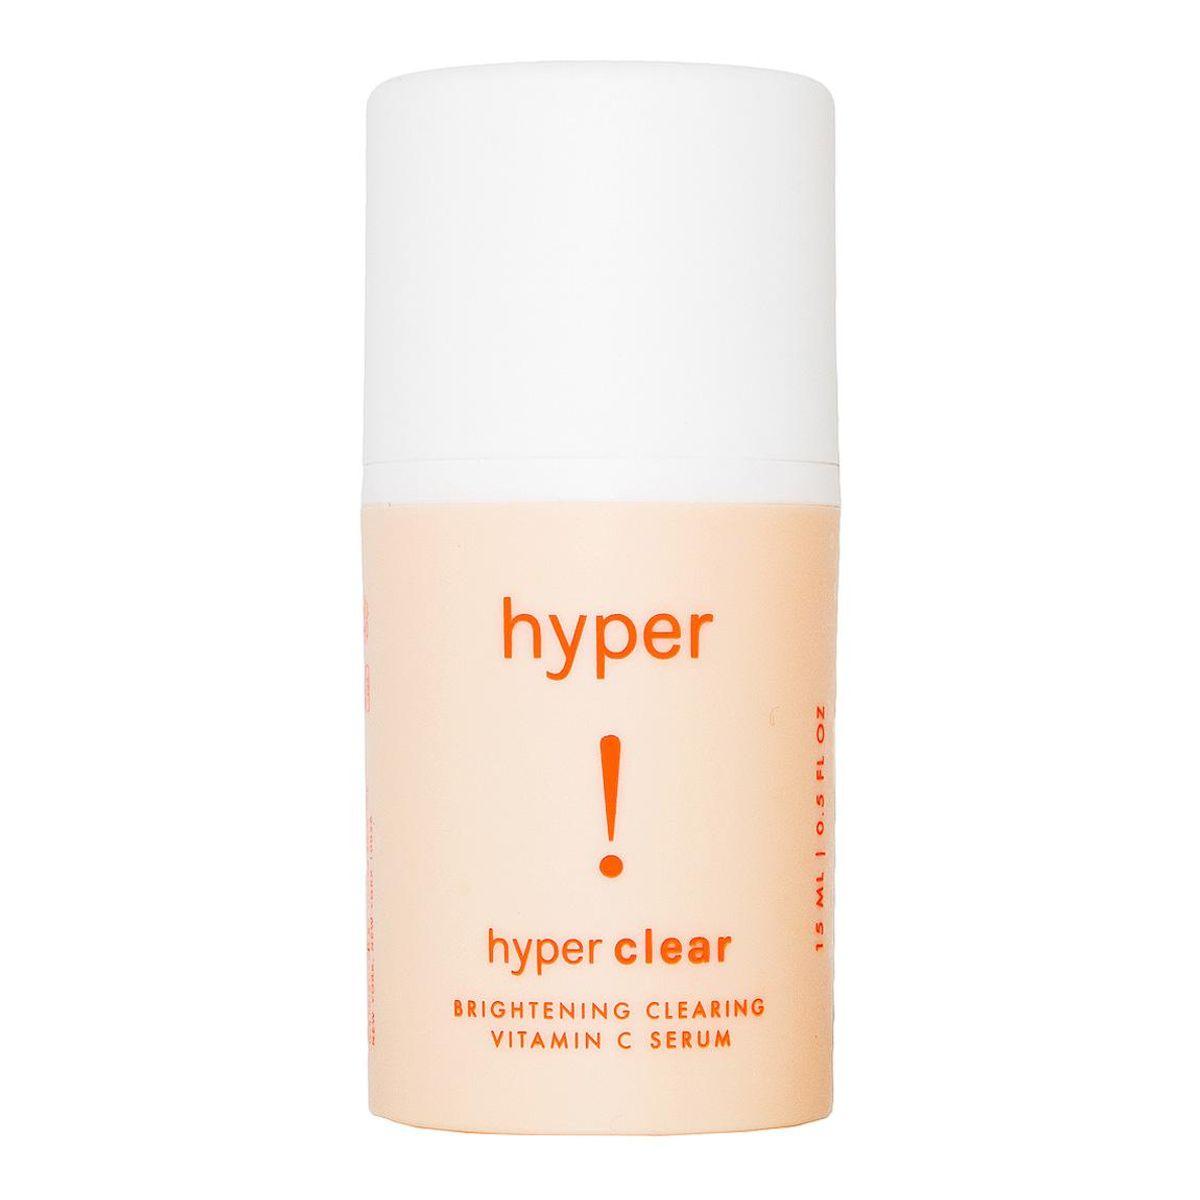 Hyper Clear Brightening Clearing Vitamin C Serum